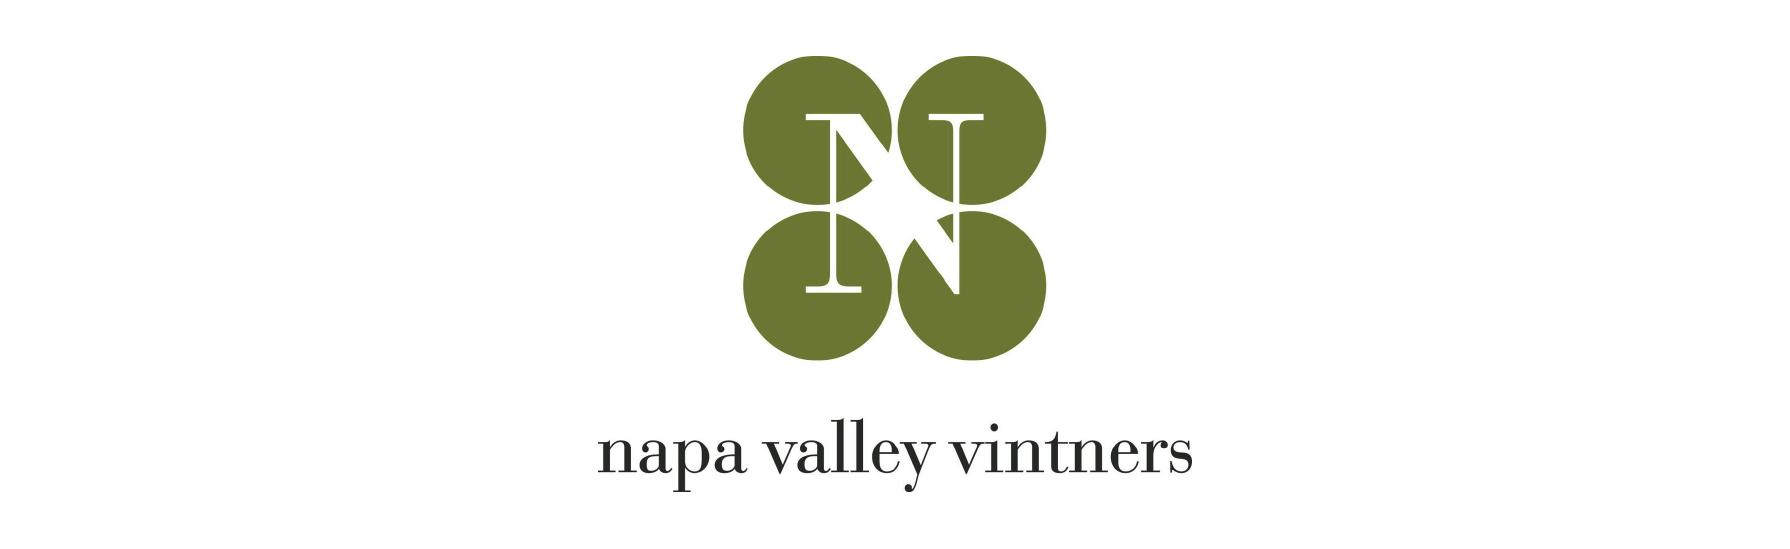 napa-valley-vintner-01.png